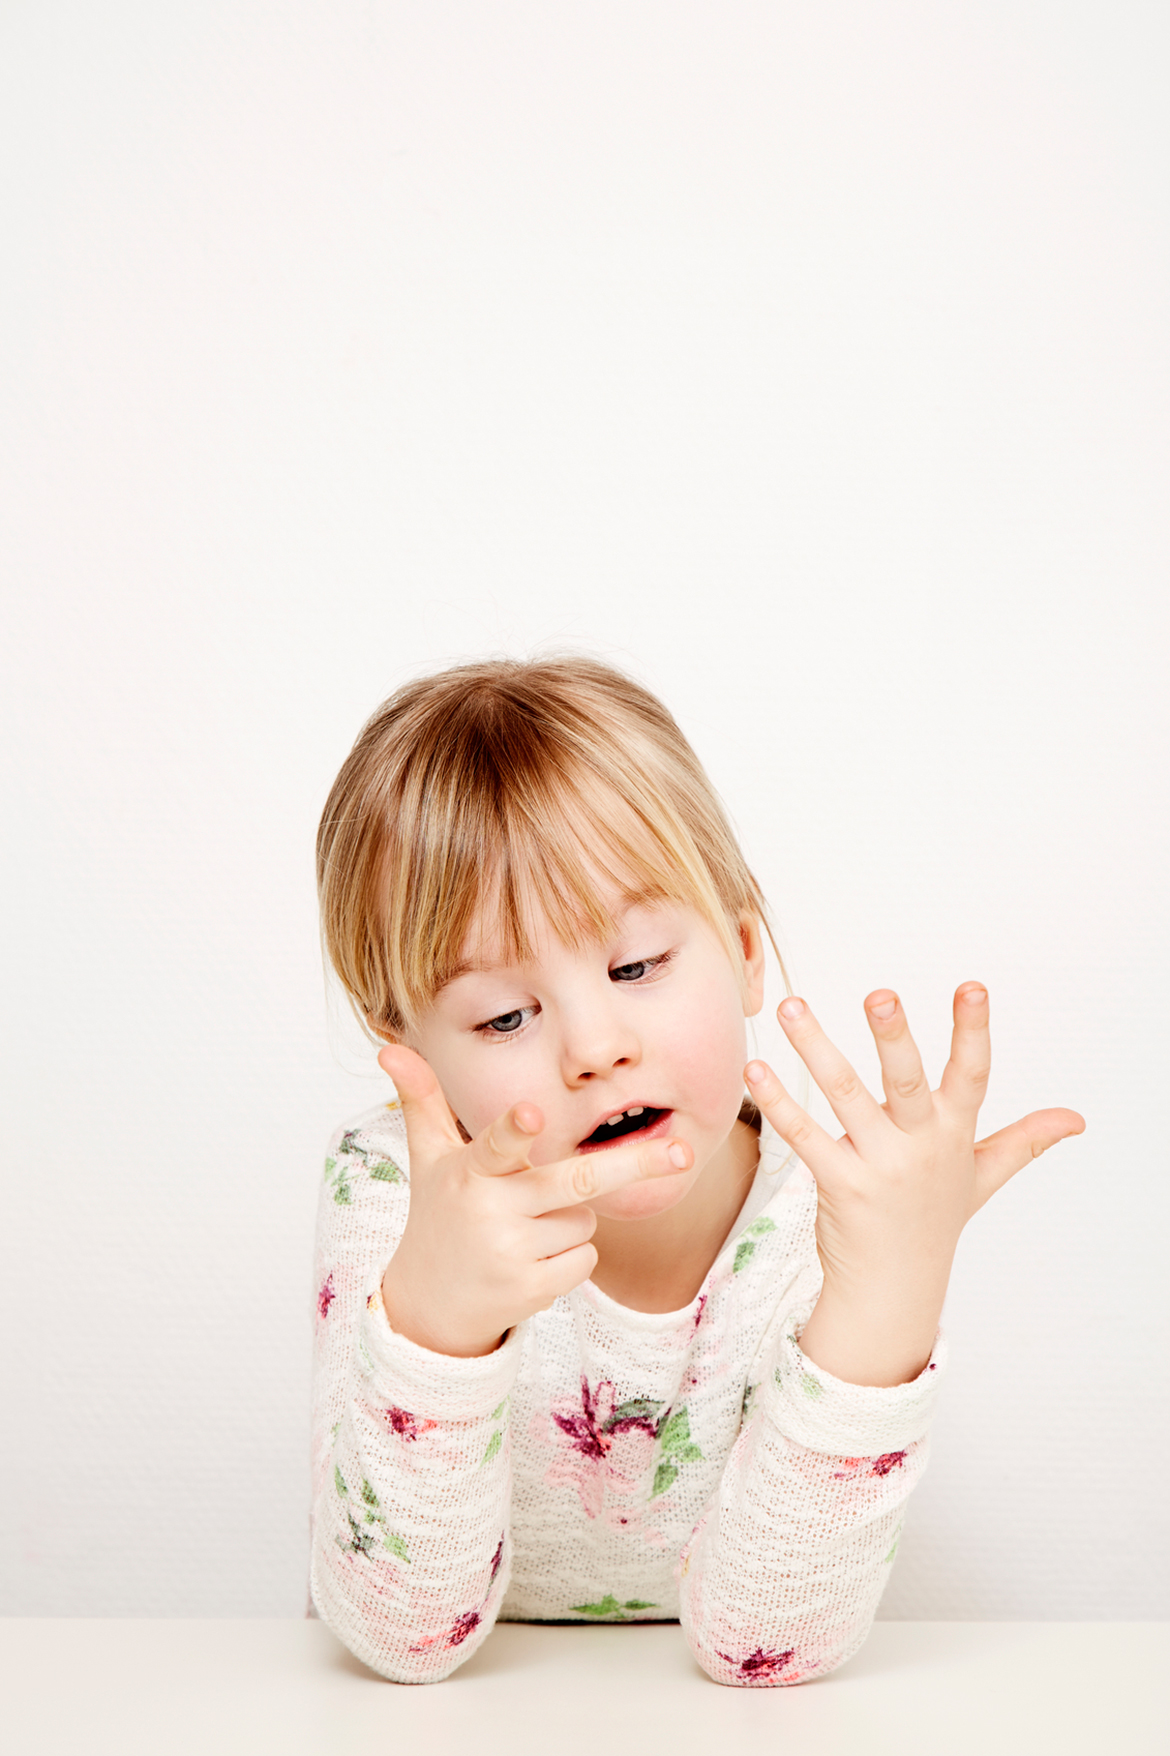 Penn Linguist Determines Tipping Point For Children